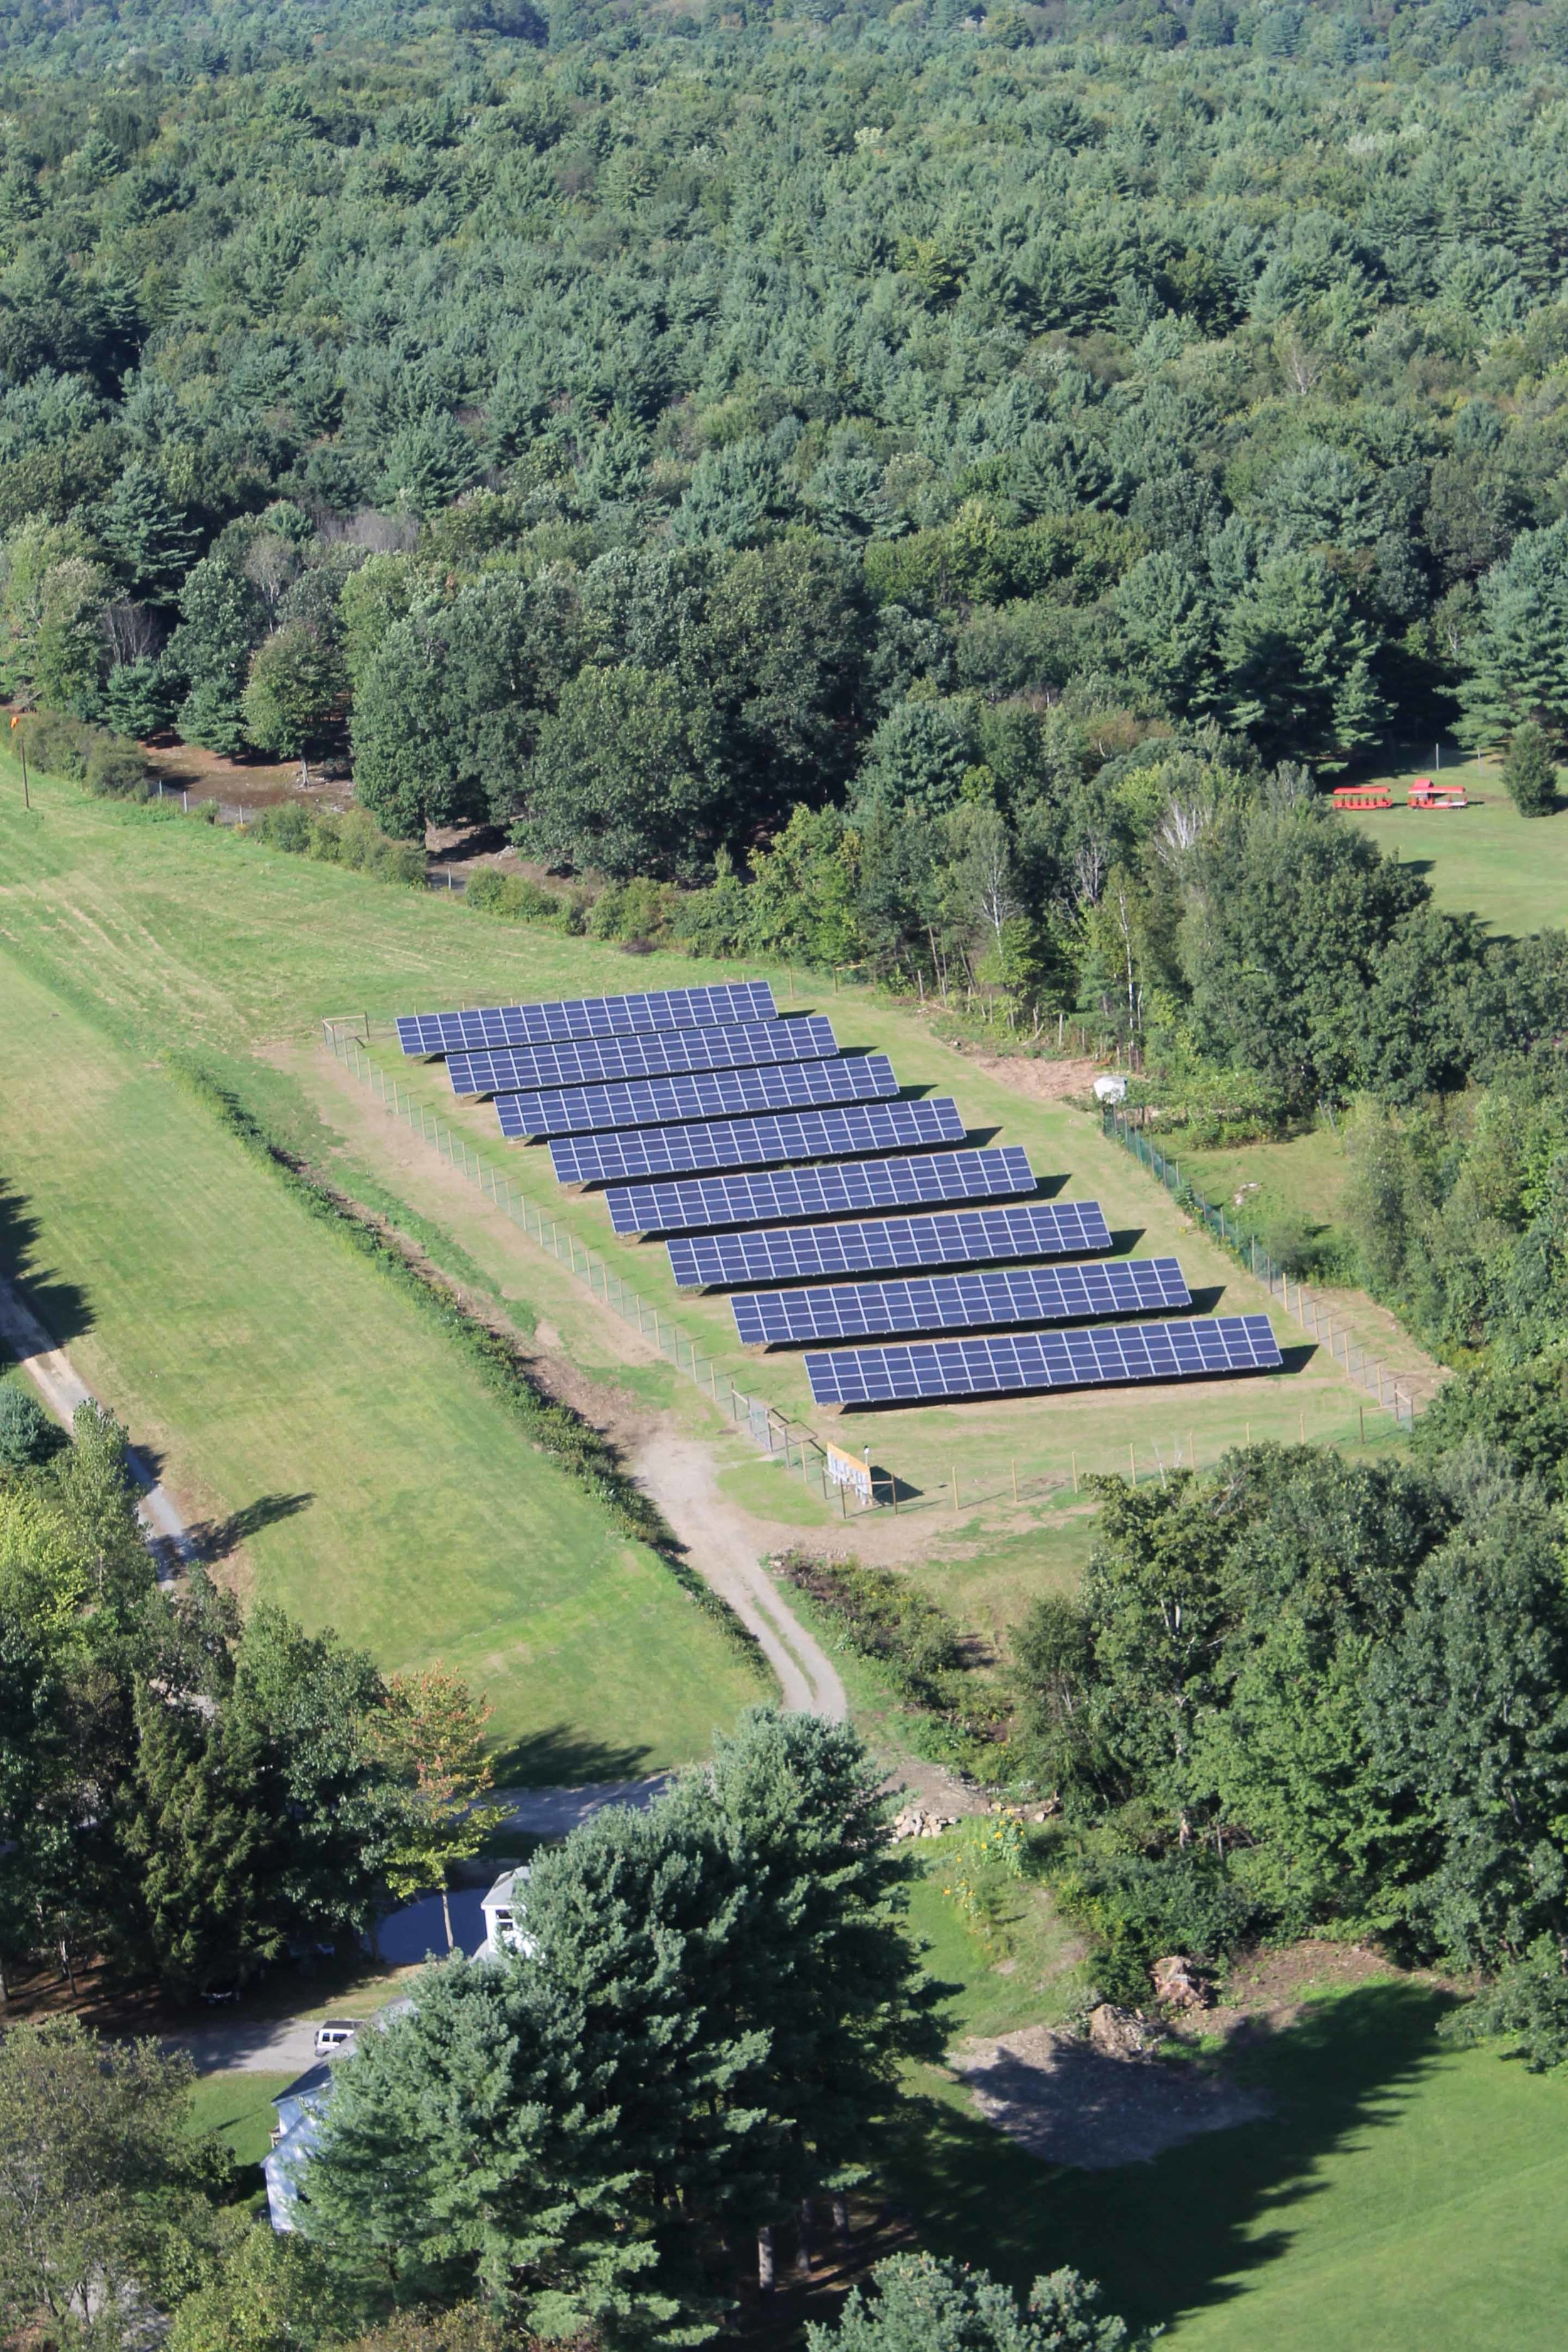 145 kW array, Green Mountain Power, Putney VT